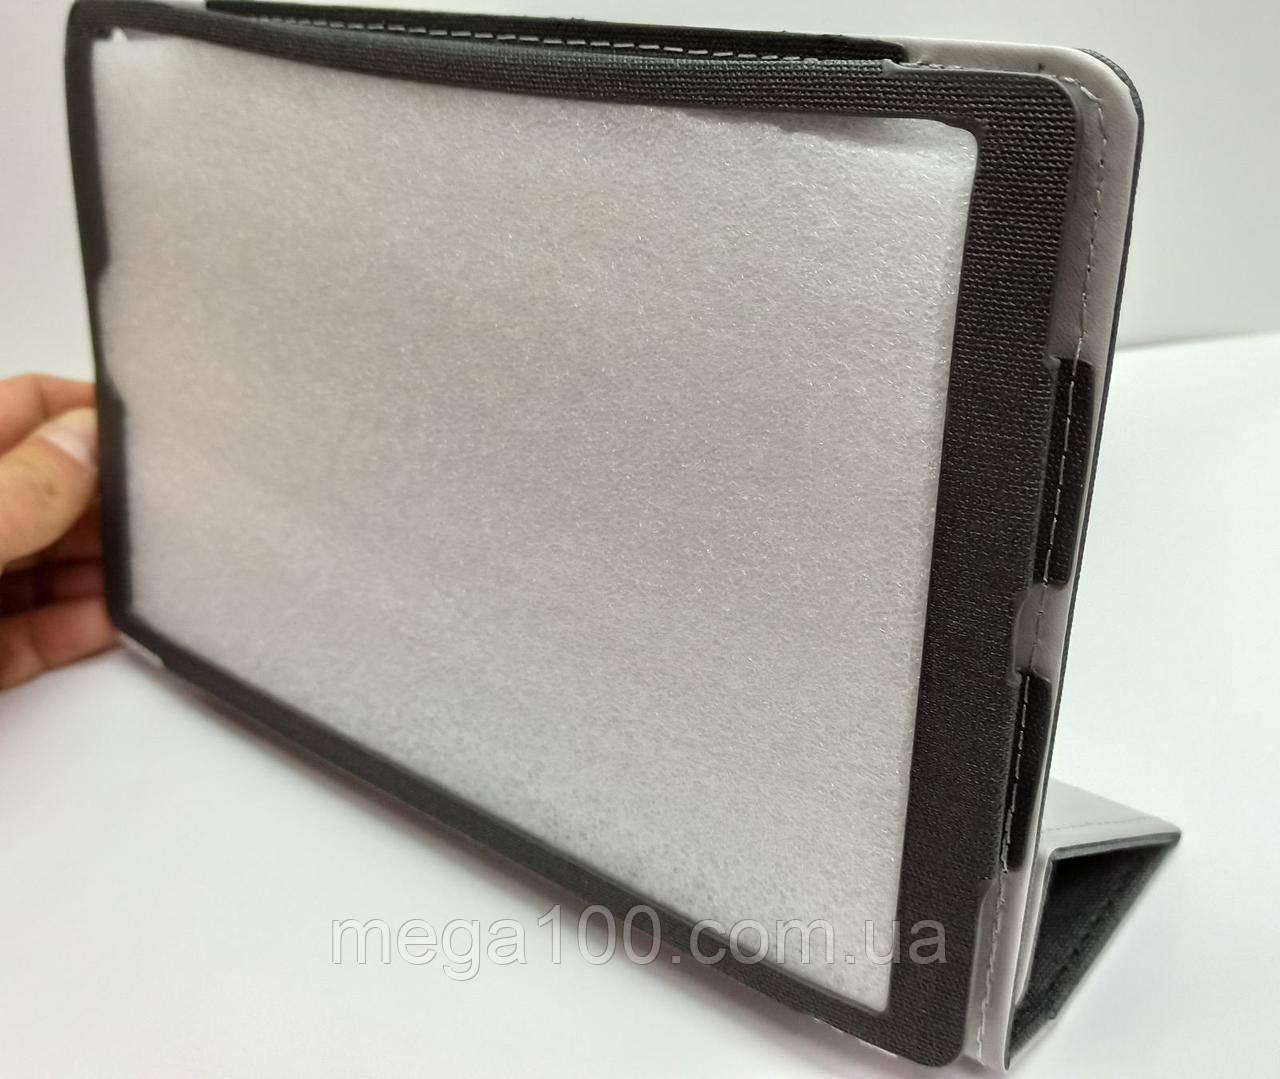 Чехол для планшета Alldocube iPlay 20